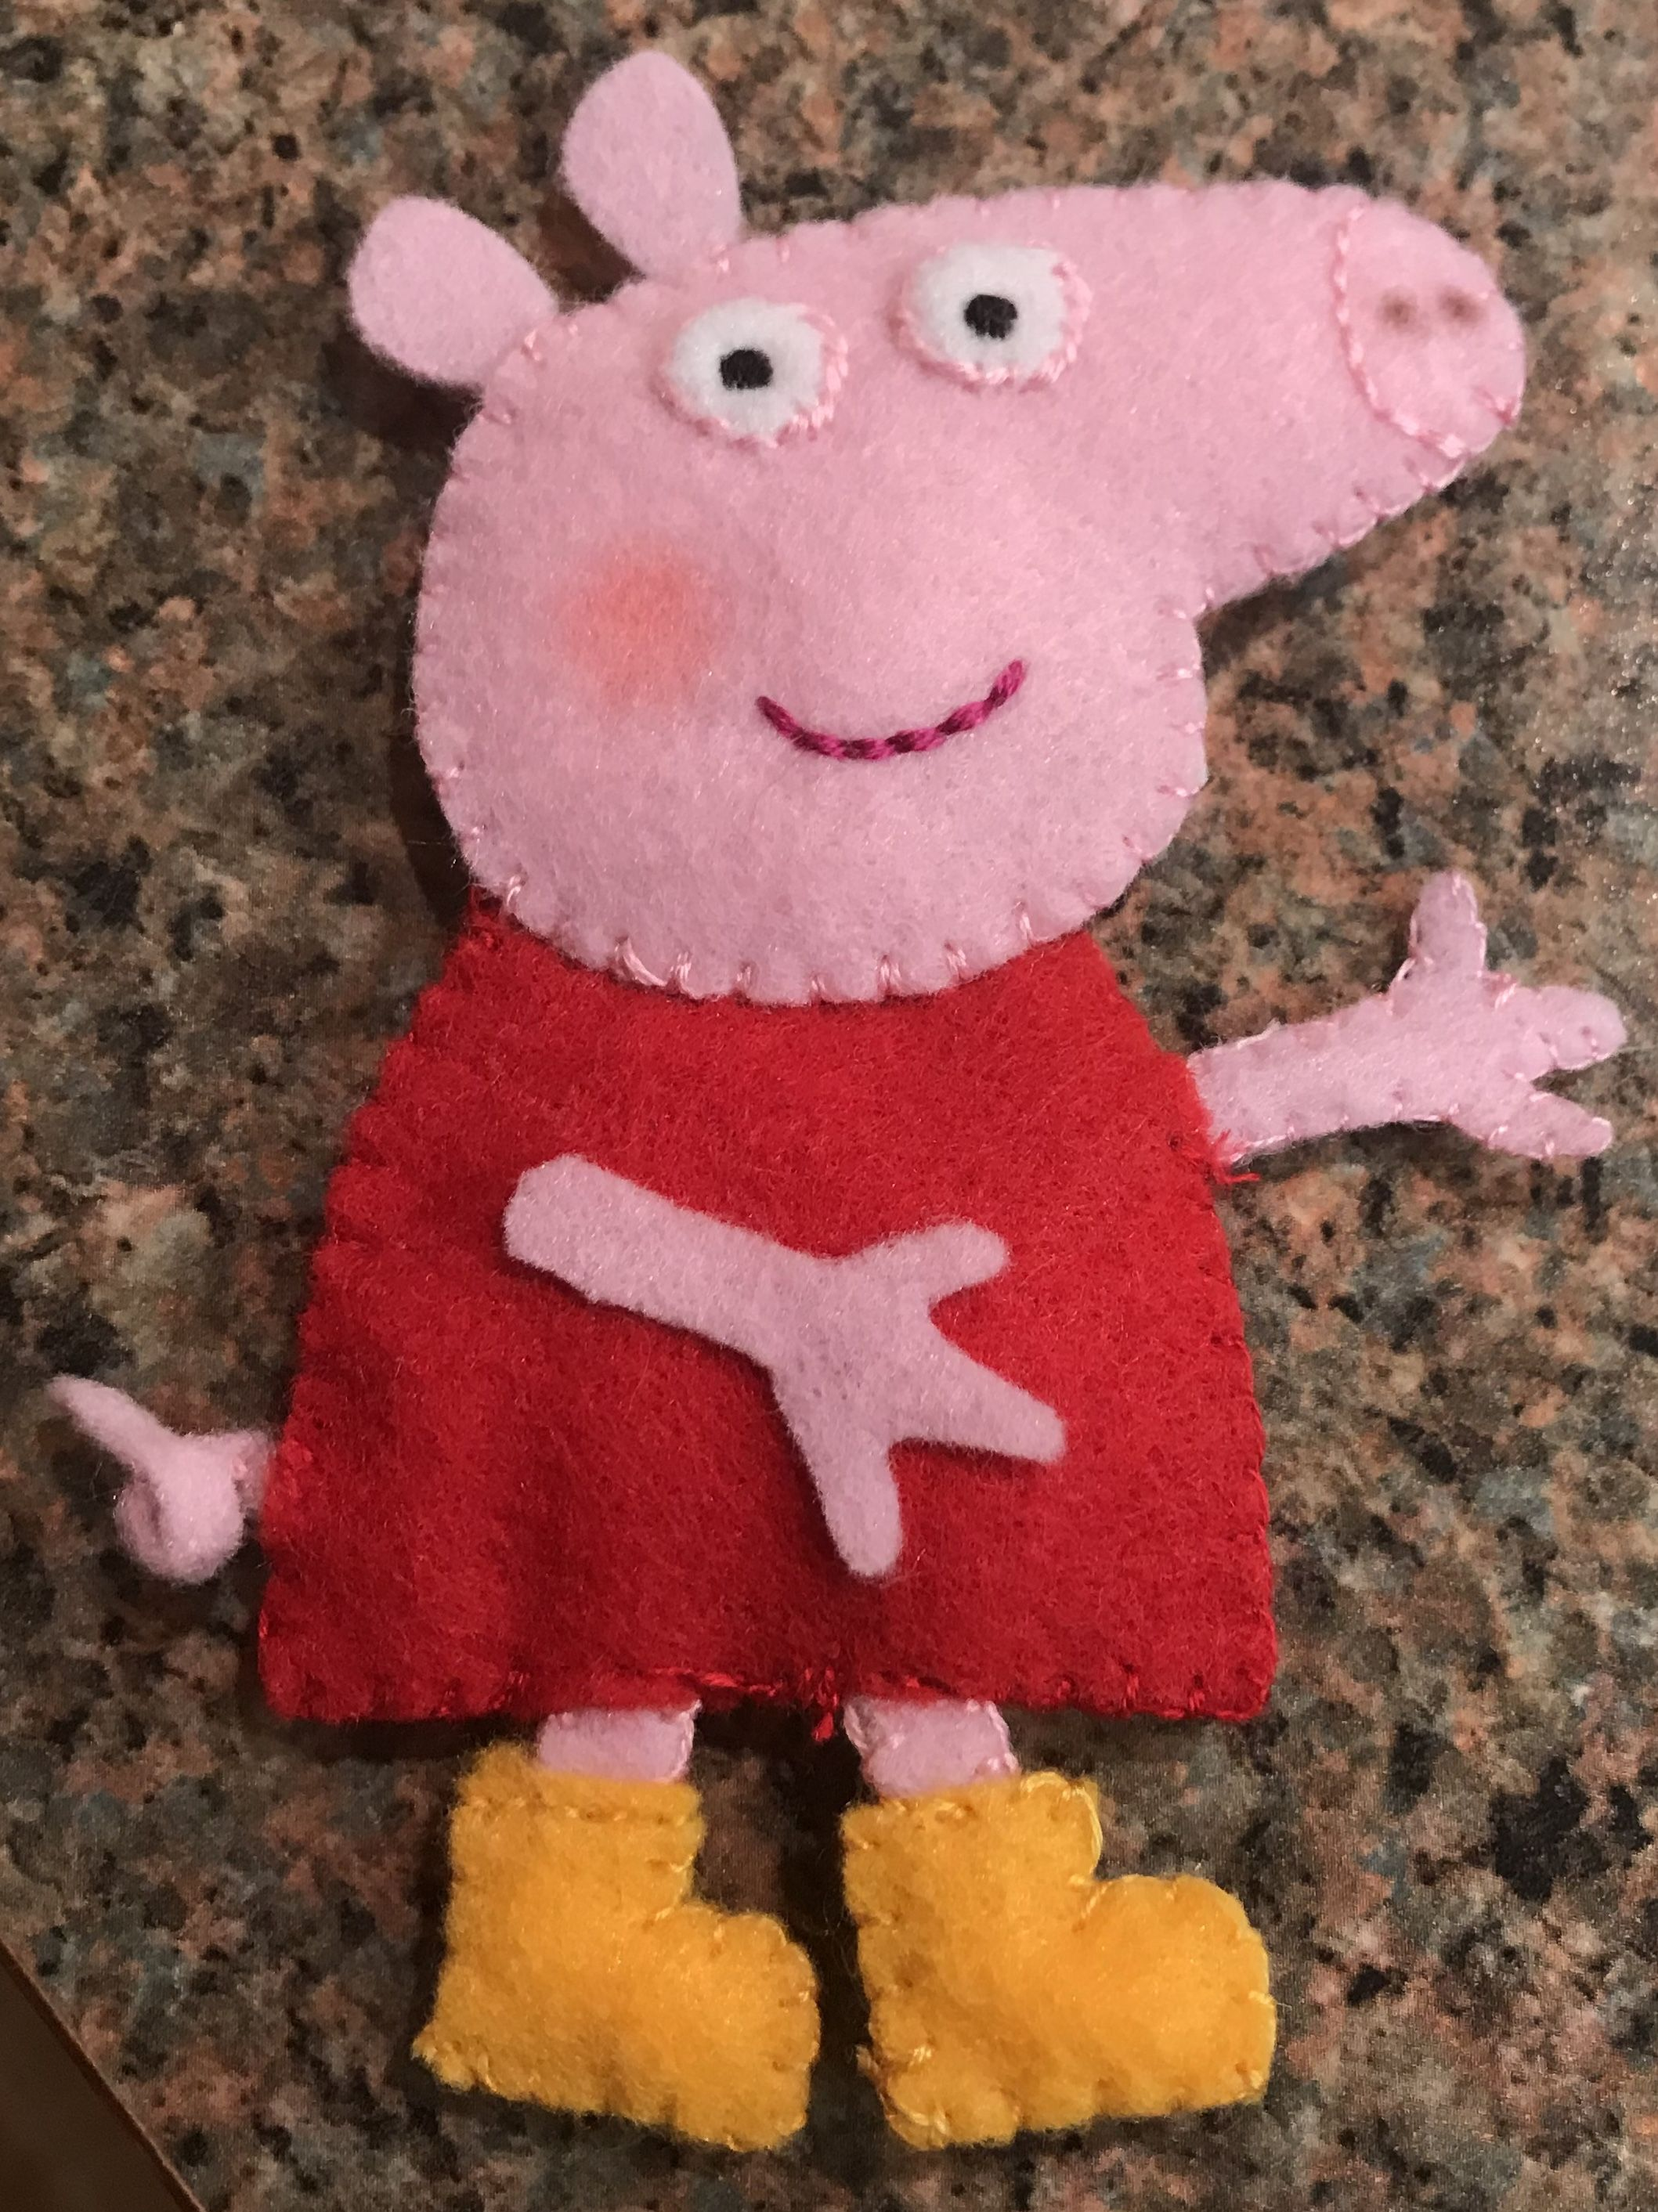 18++ Peppa pig stuffed animal images